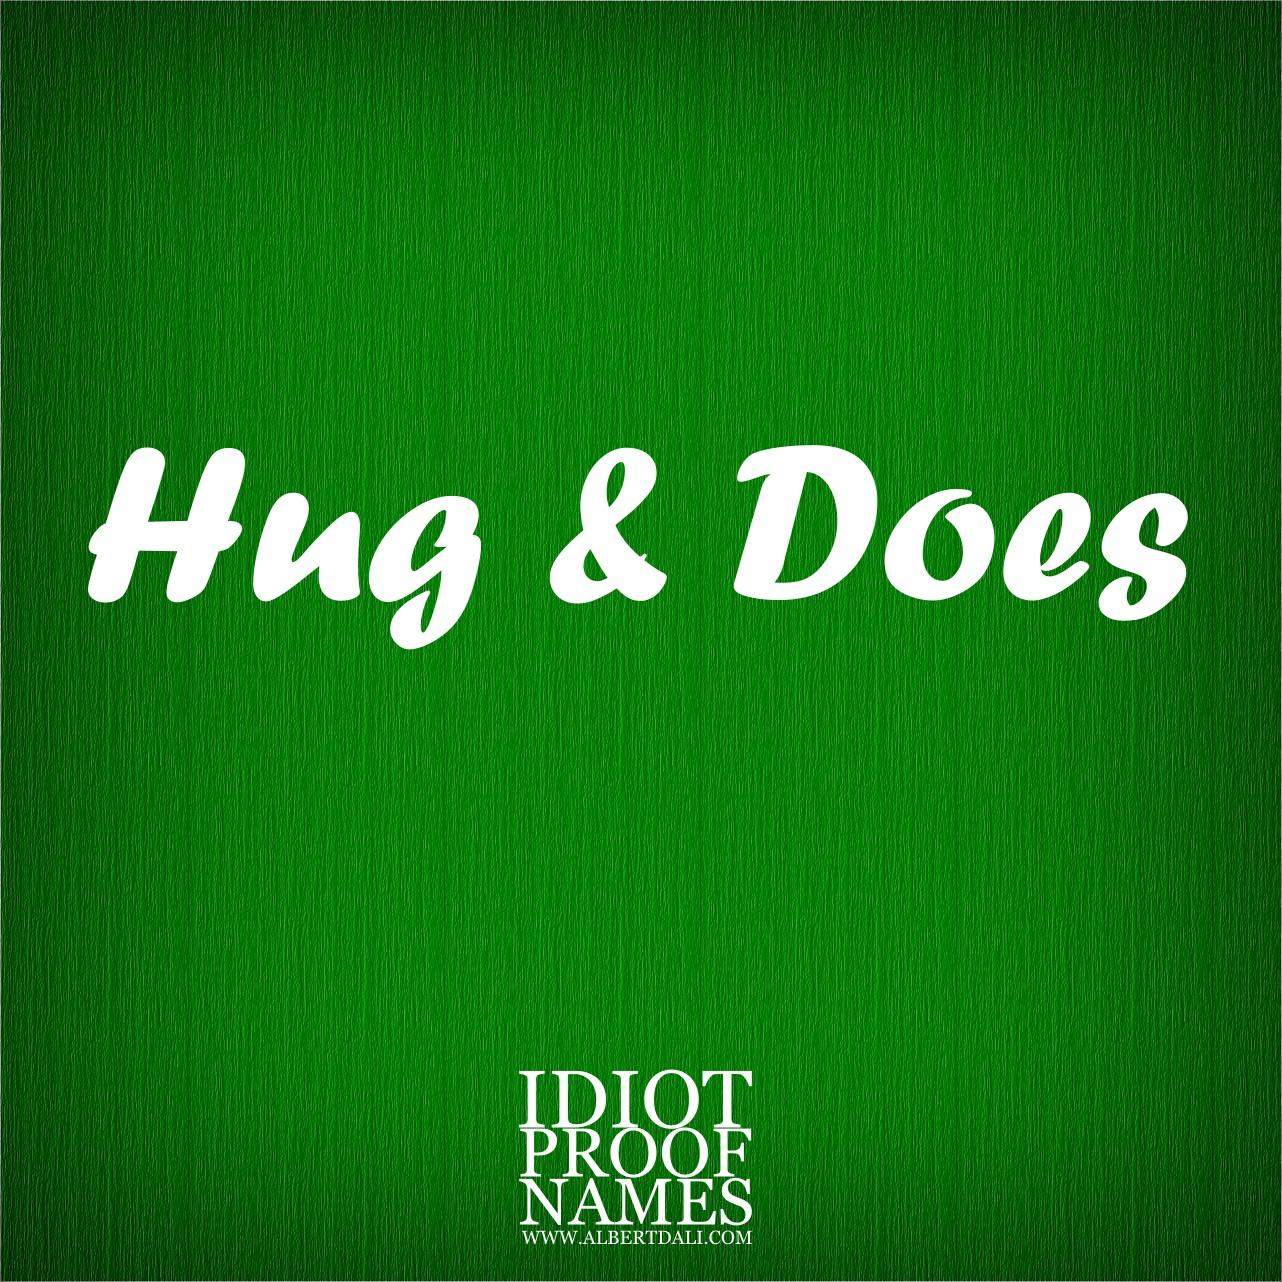 Albert Dali, Hug & Does, Idiot Proof Names, www.AlbertDali.com